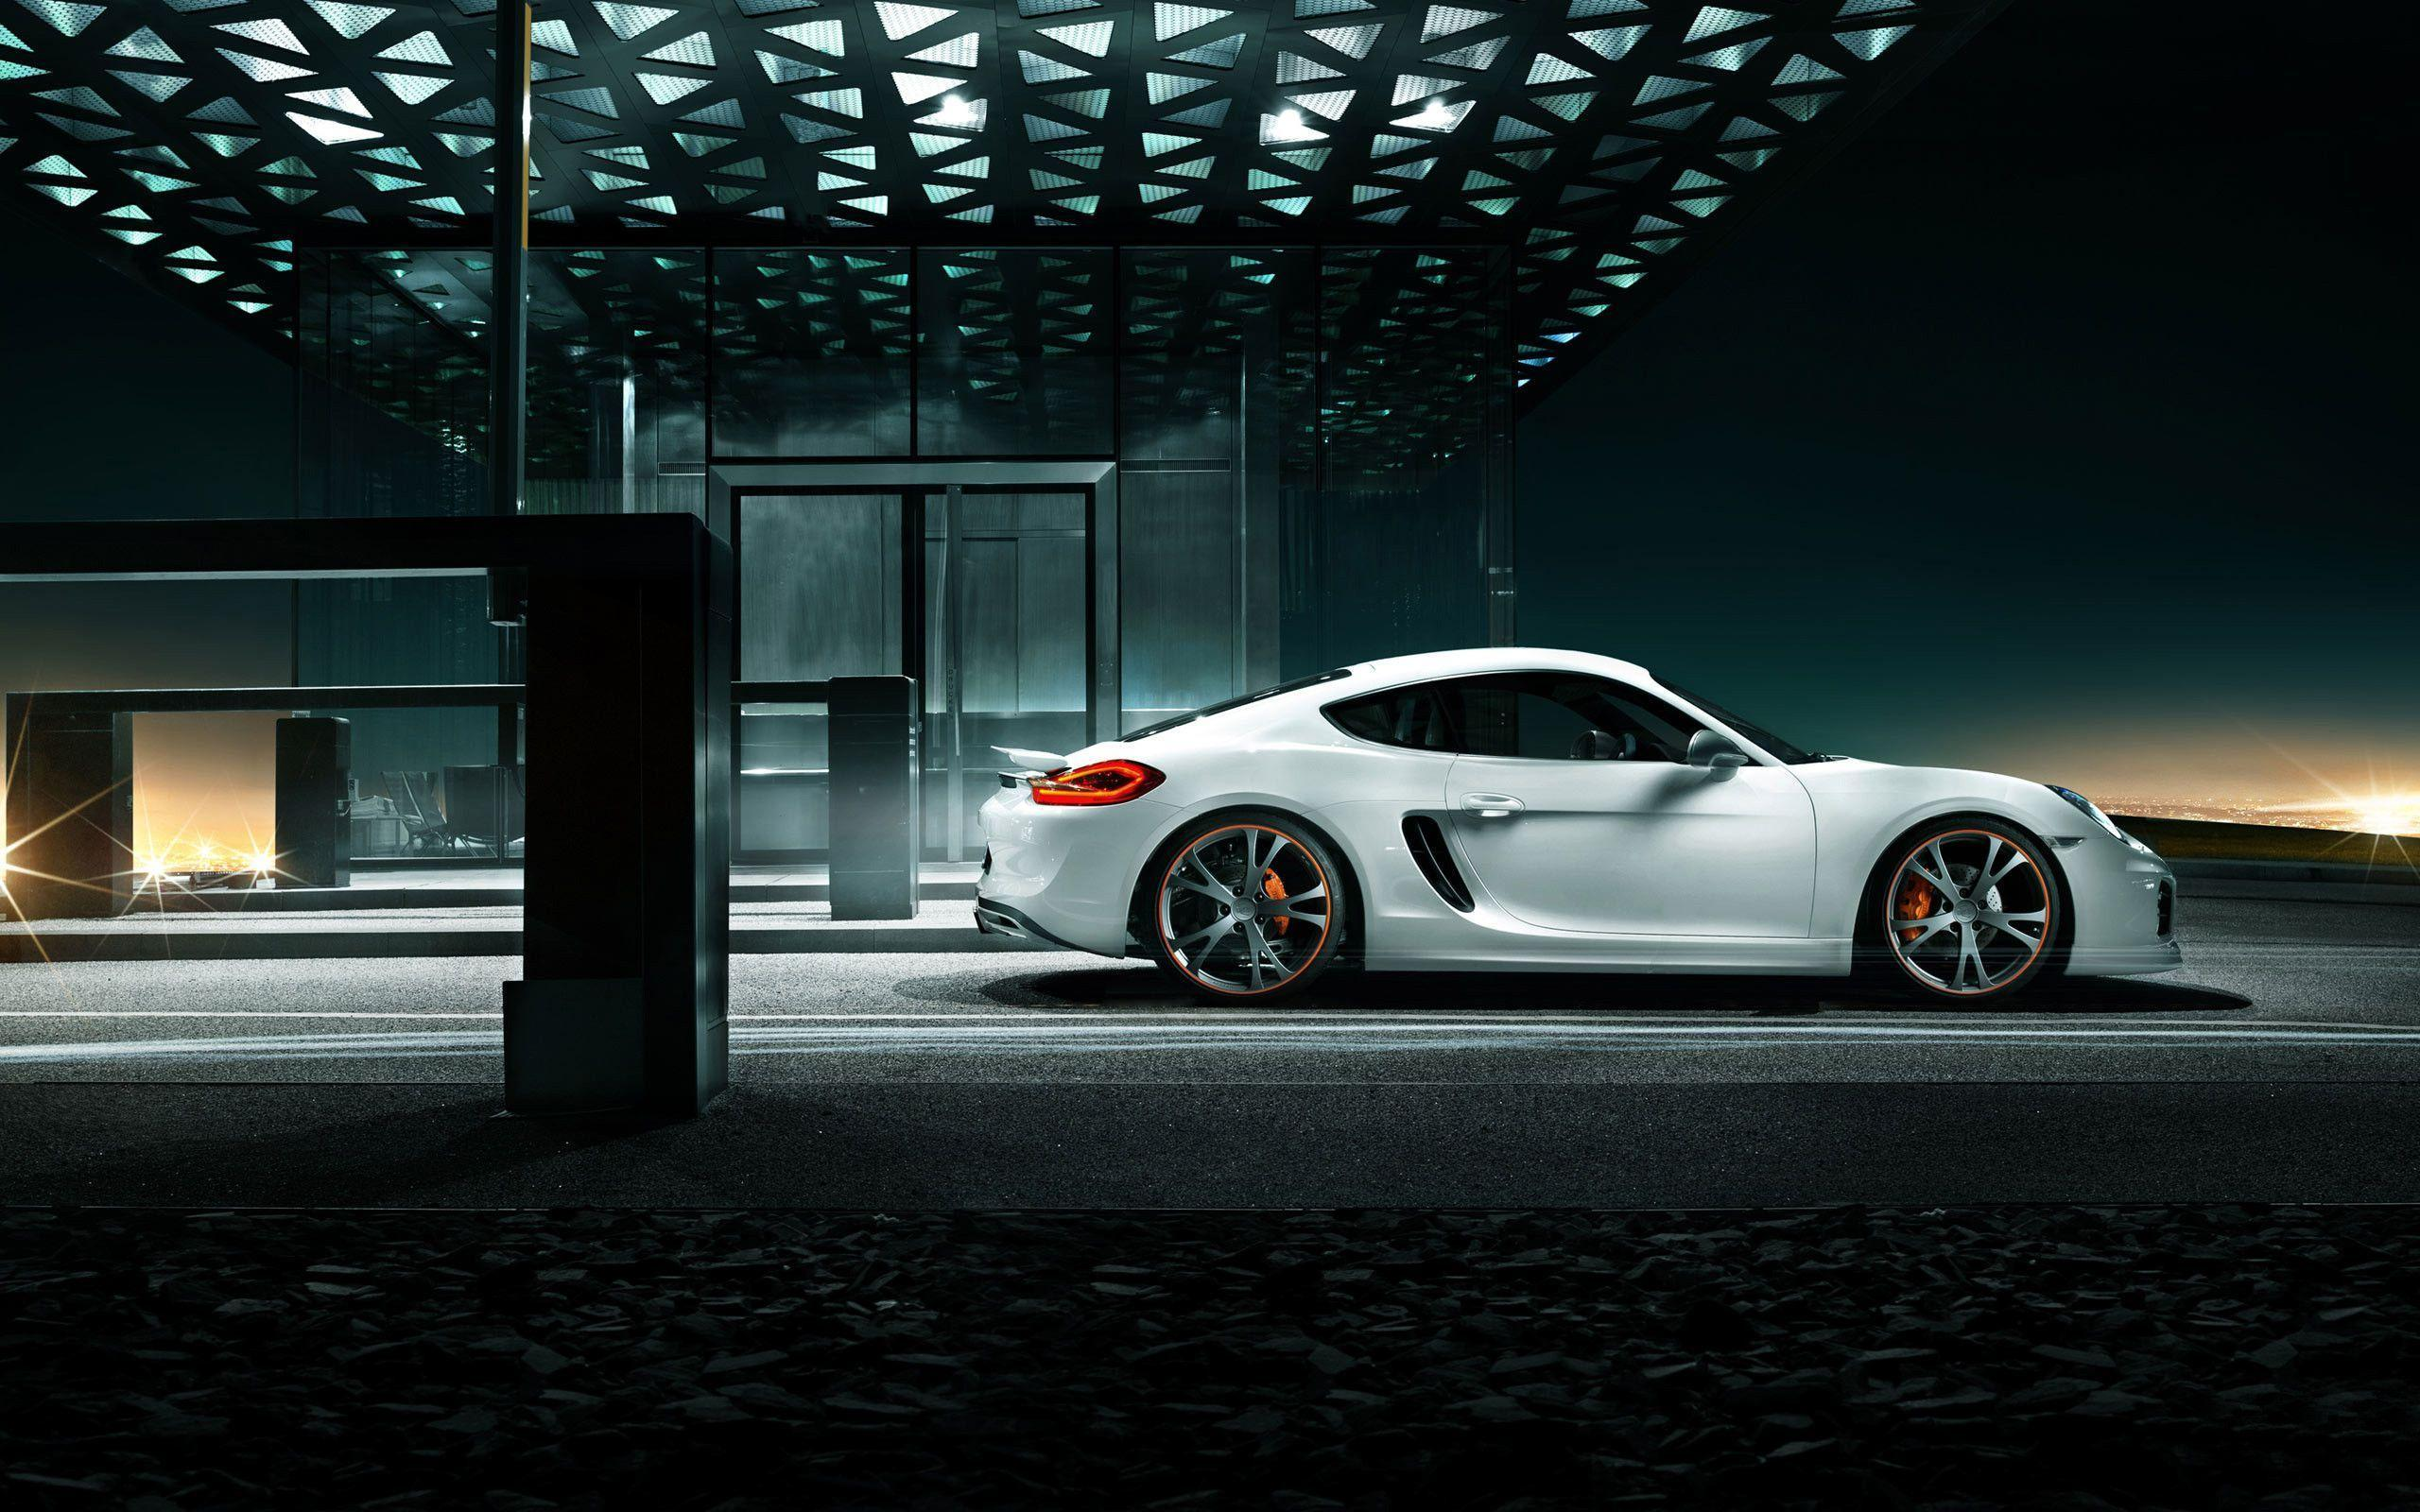 Die 68 Besten Porsche Wallpapers: Porsche Cayman Wallpapers